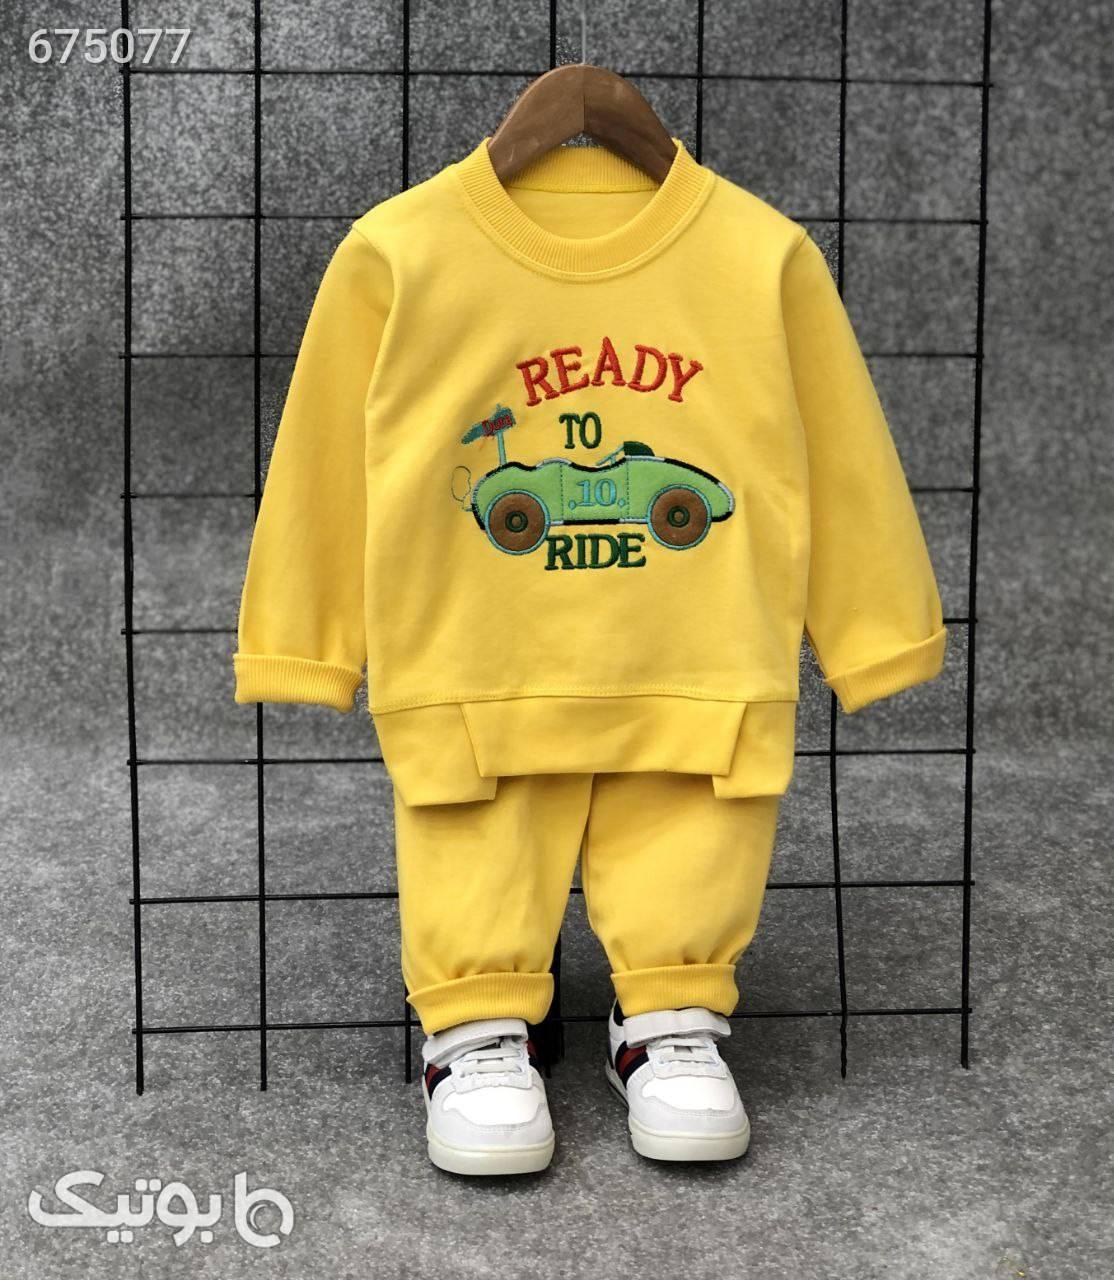 بلوز و شلوار زرد لباس کودک پسرانه